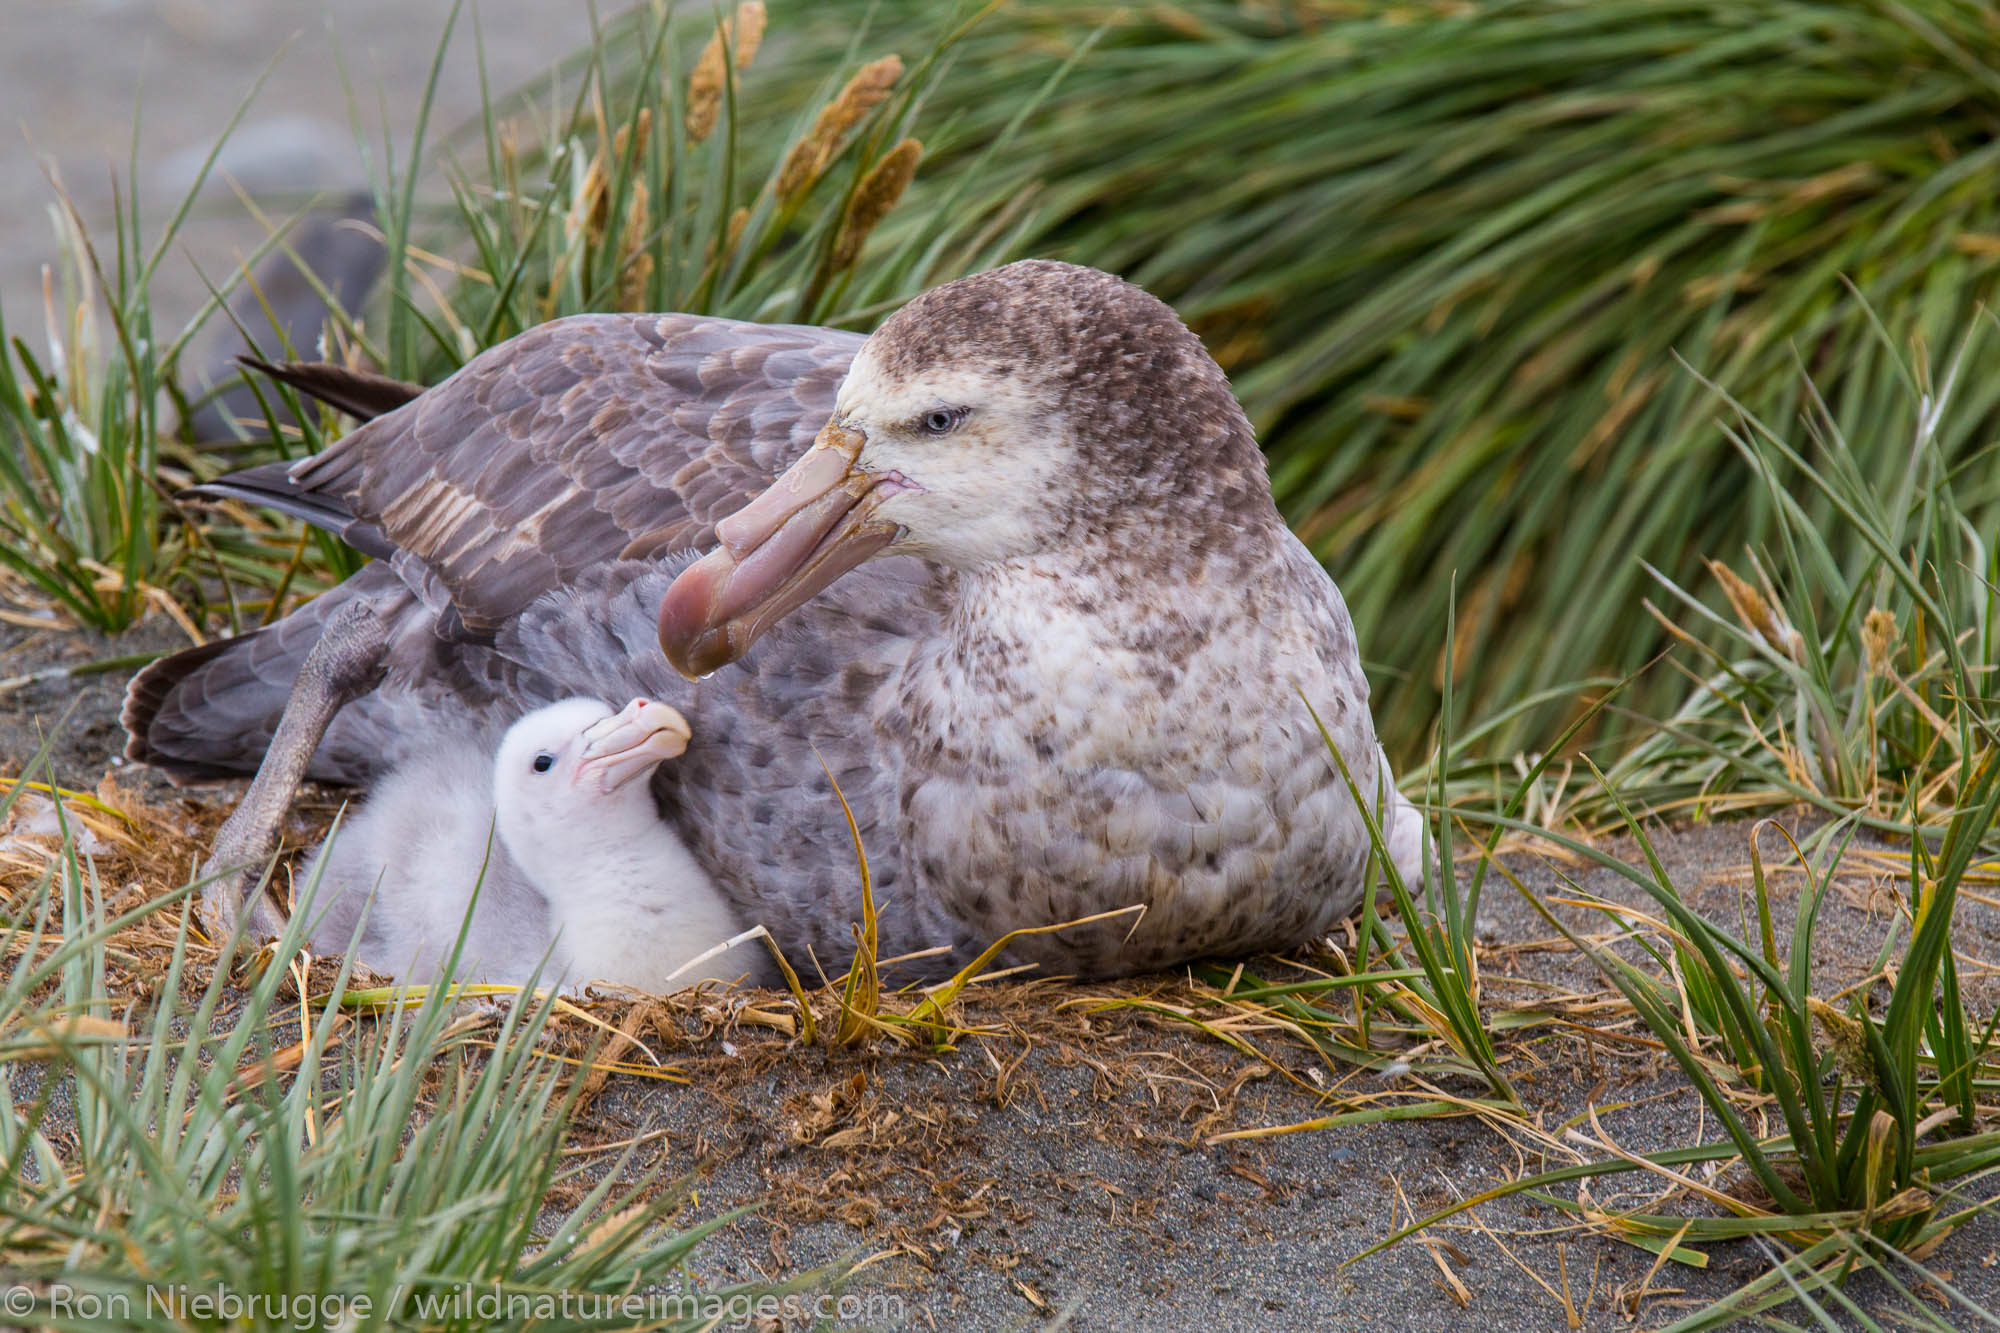 Nesting Northern Giant Petrel, Salisbury Plain, South Georgia, Antarctica.